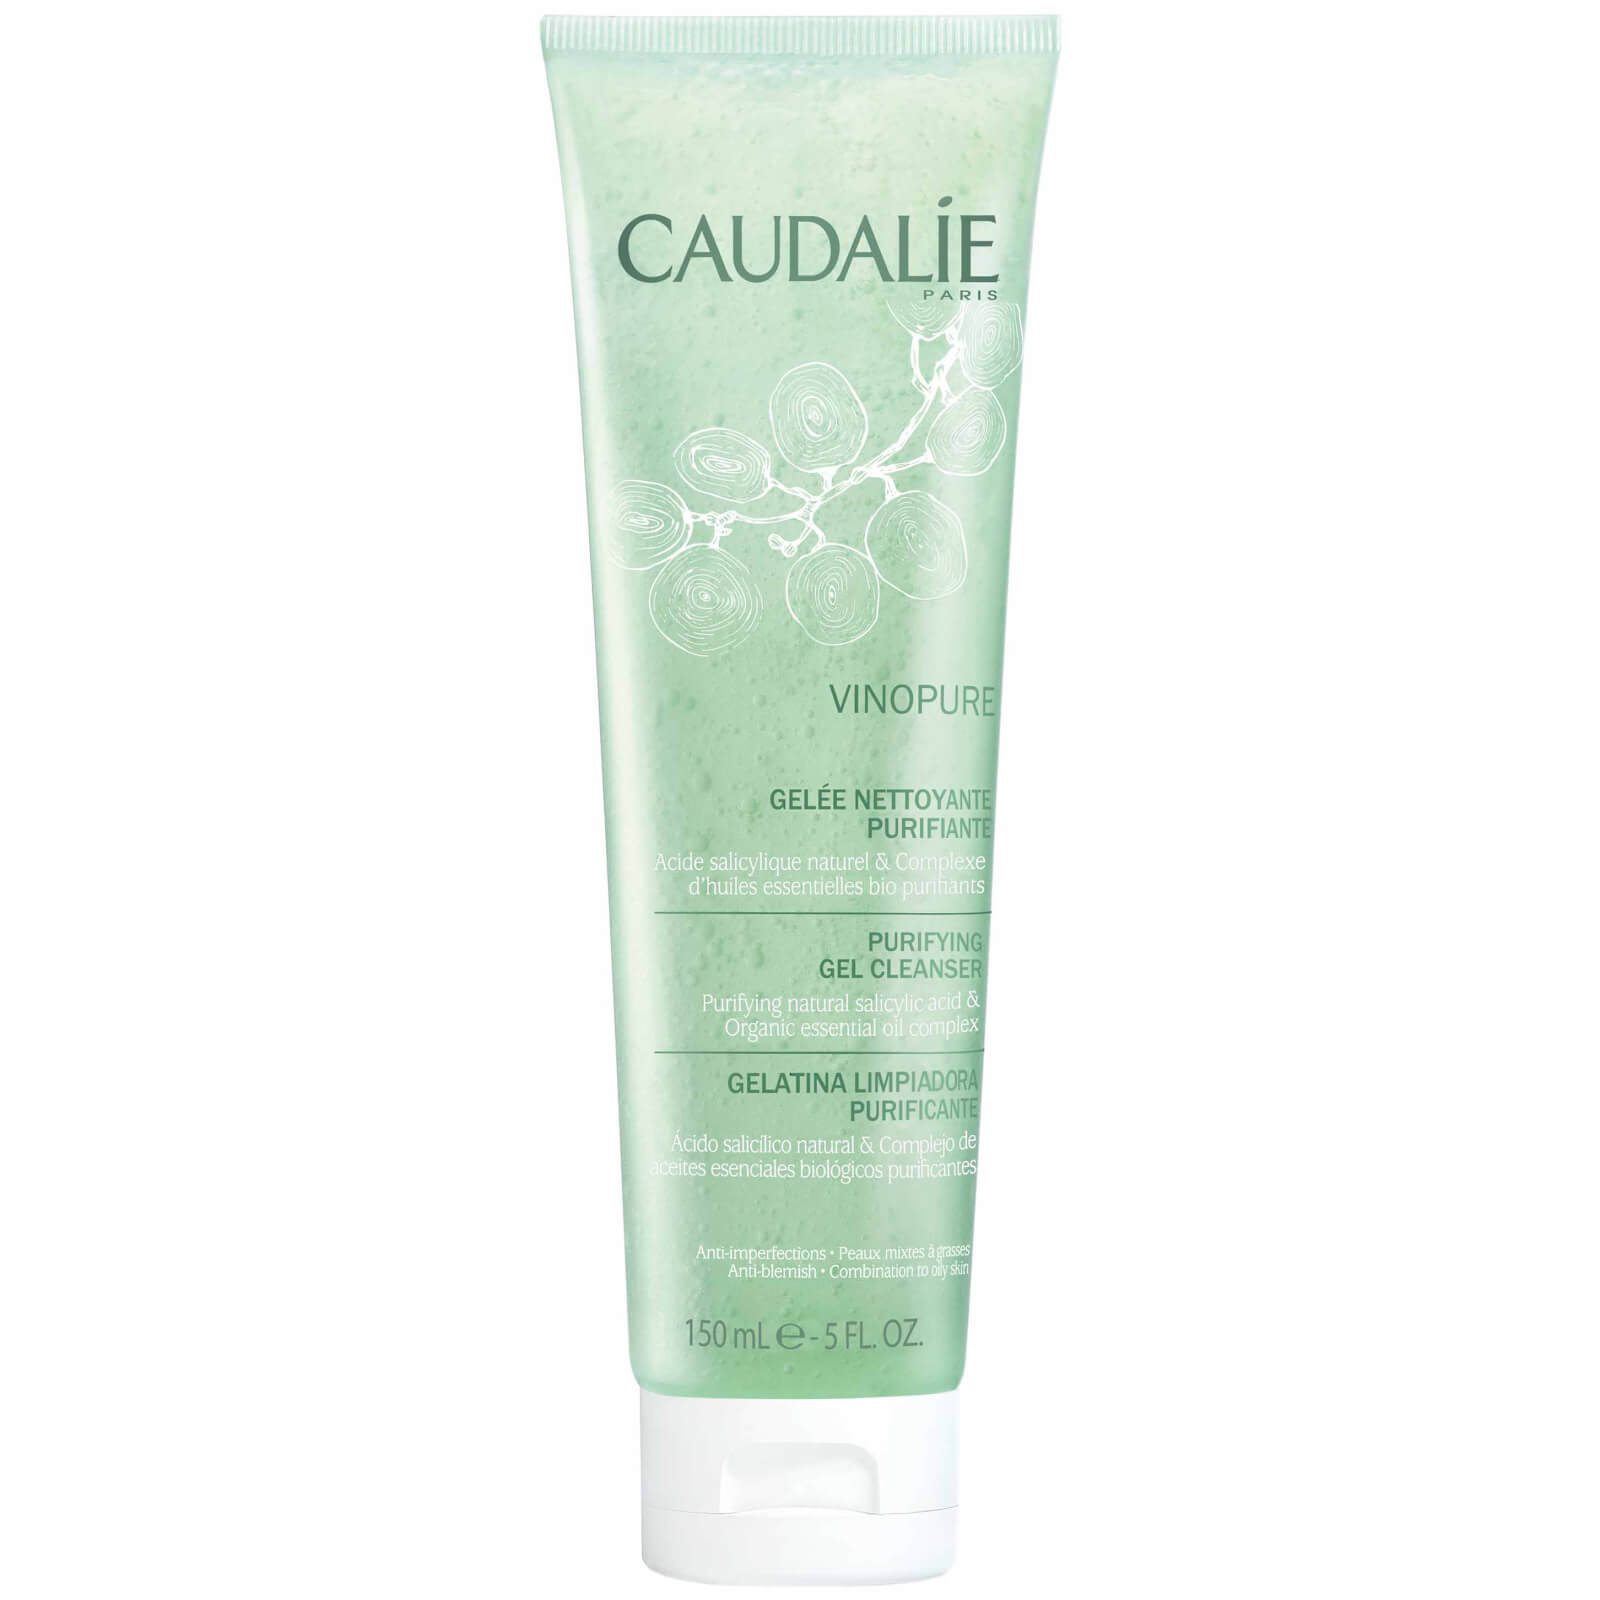 Caudalie Vinopure Purifying Gel Cleanser 150ml